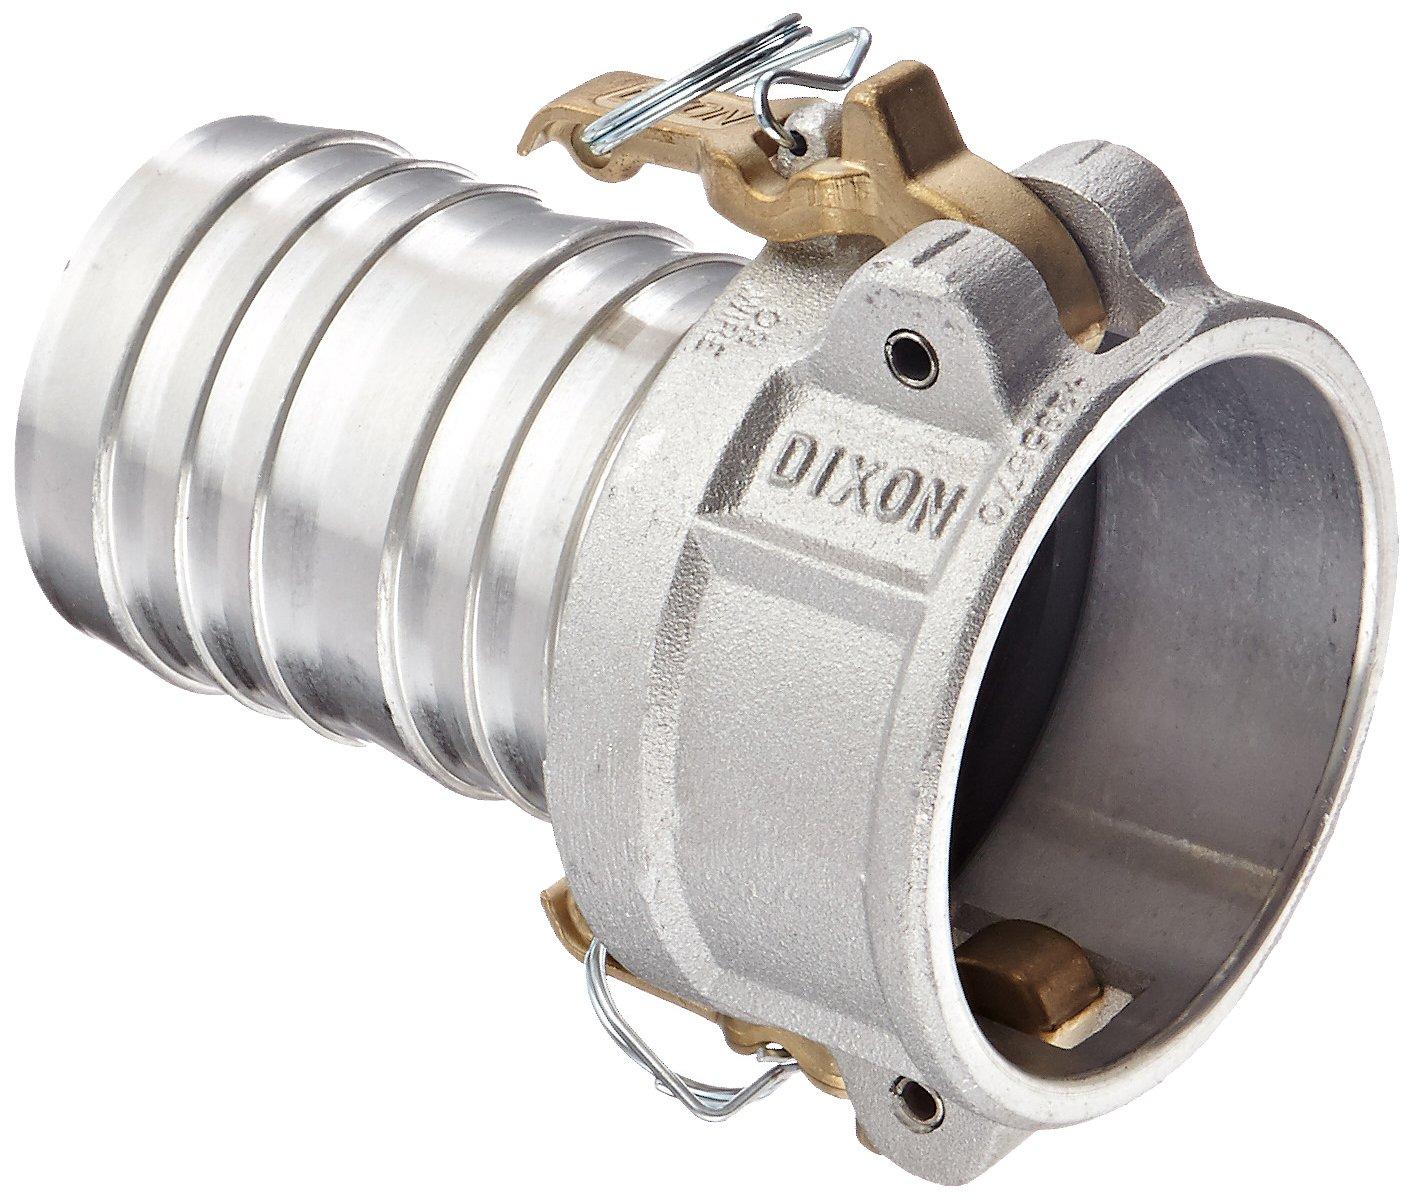 Dixon AC300 Aluminum 356T6 Boss-Lock Type C Cam and Groove Hose Fitting, 3'' Socket x 3'' Hose ID Barbed